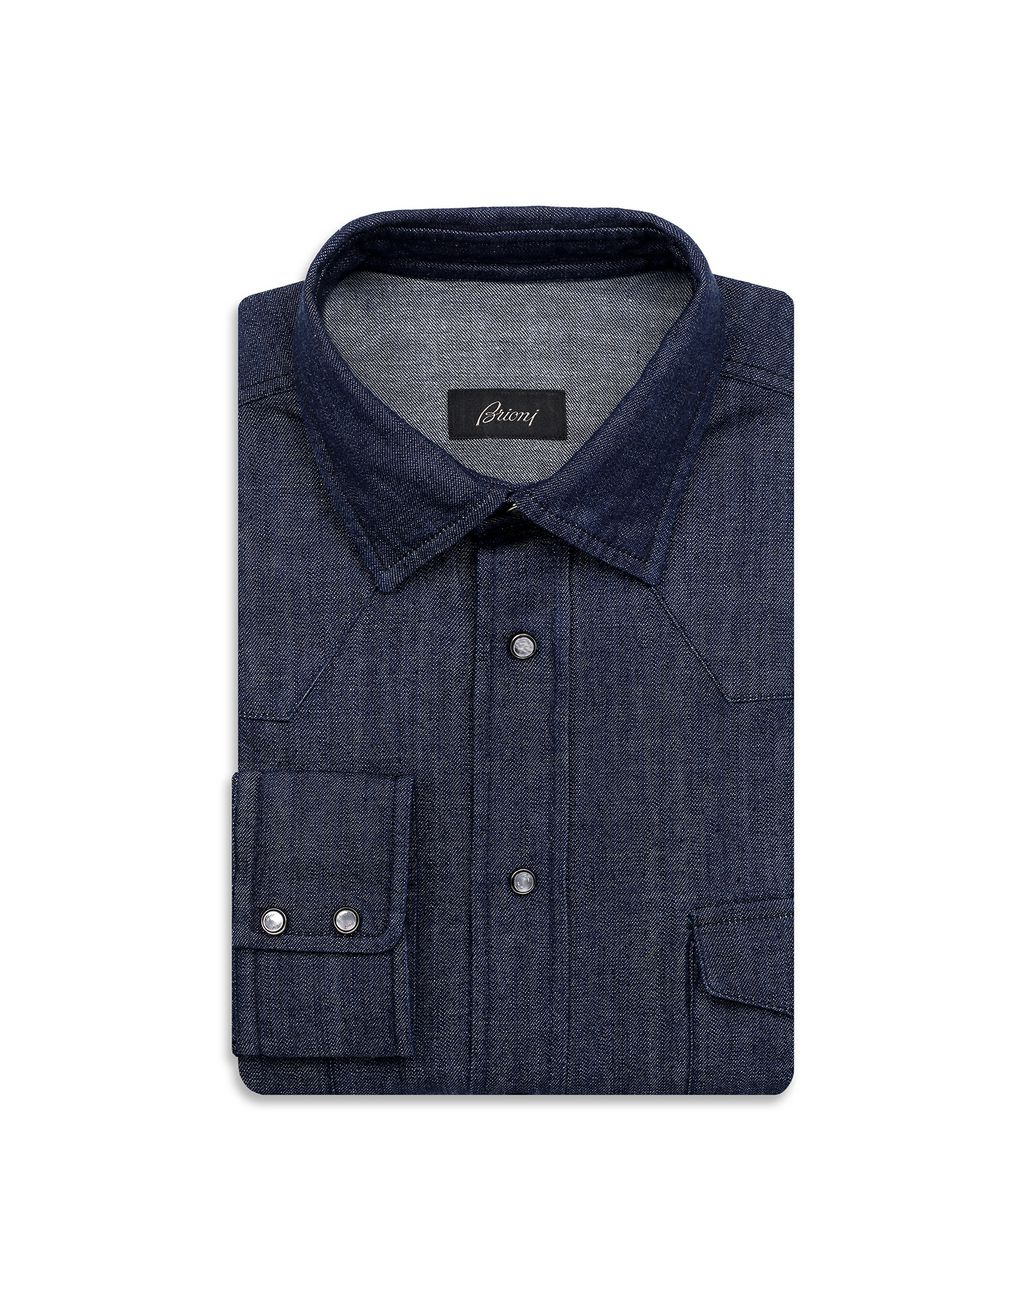 BRIONI Тёмно-синяя джинсовая рубашка Pубашка Для Мужчин f